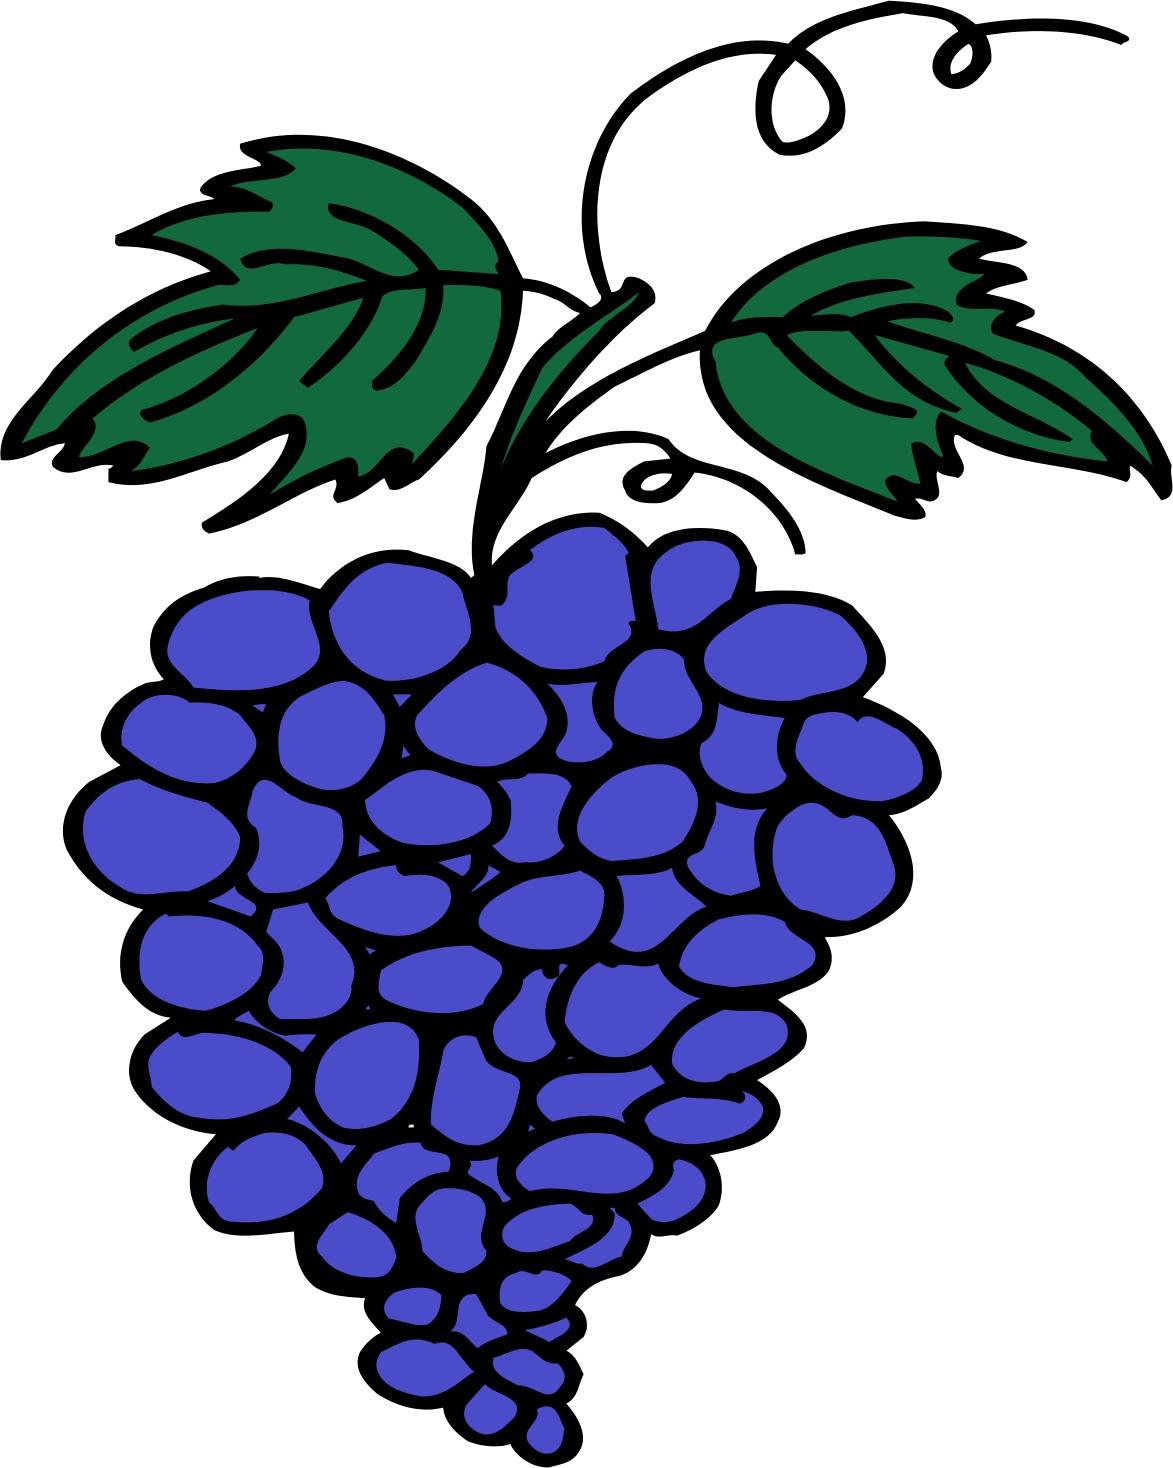 Cartoon Grapes.